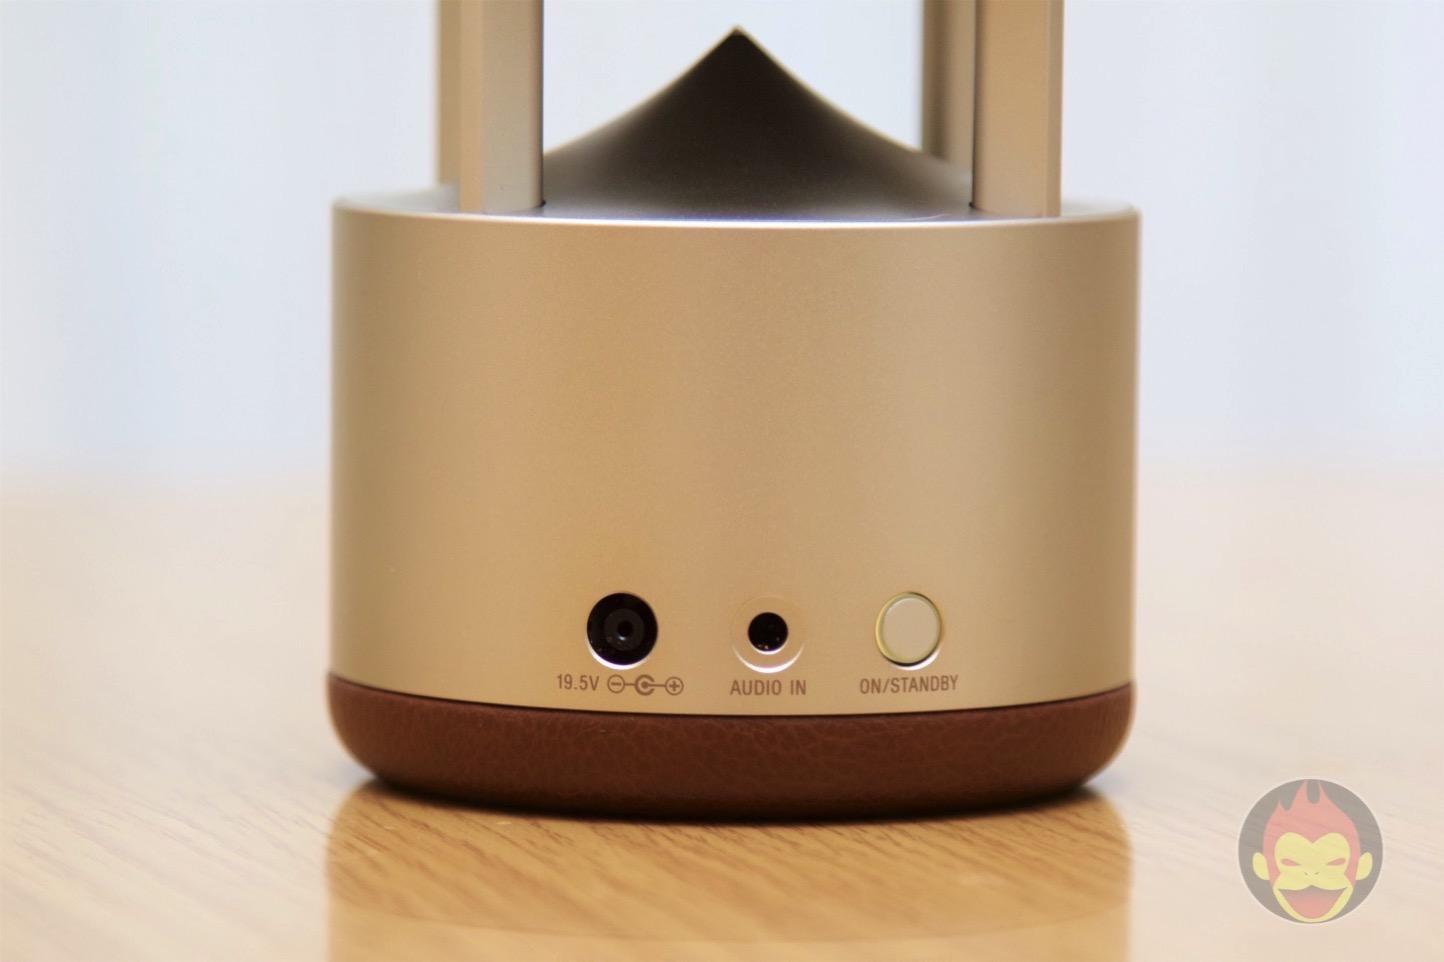 Sony Bluetooth Speaker lspx-s1